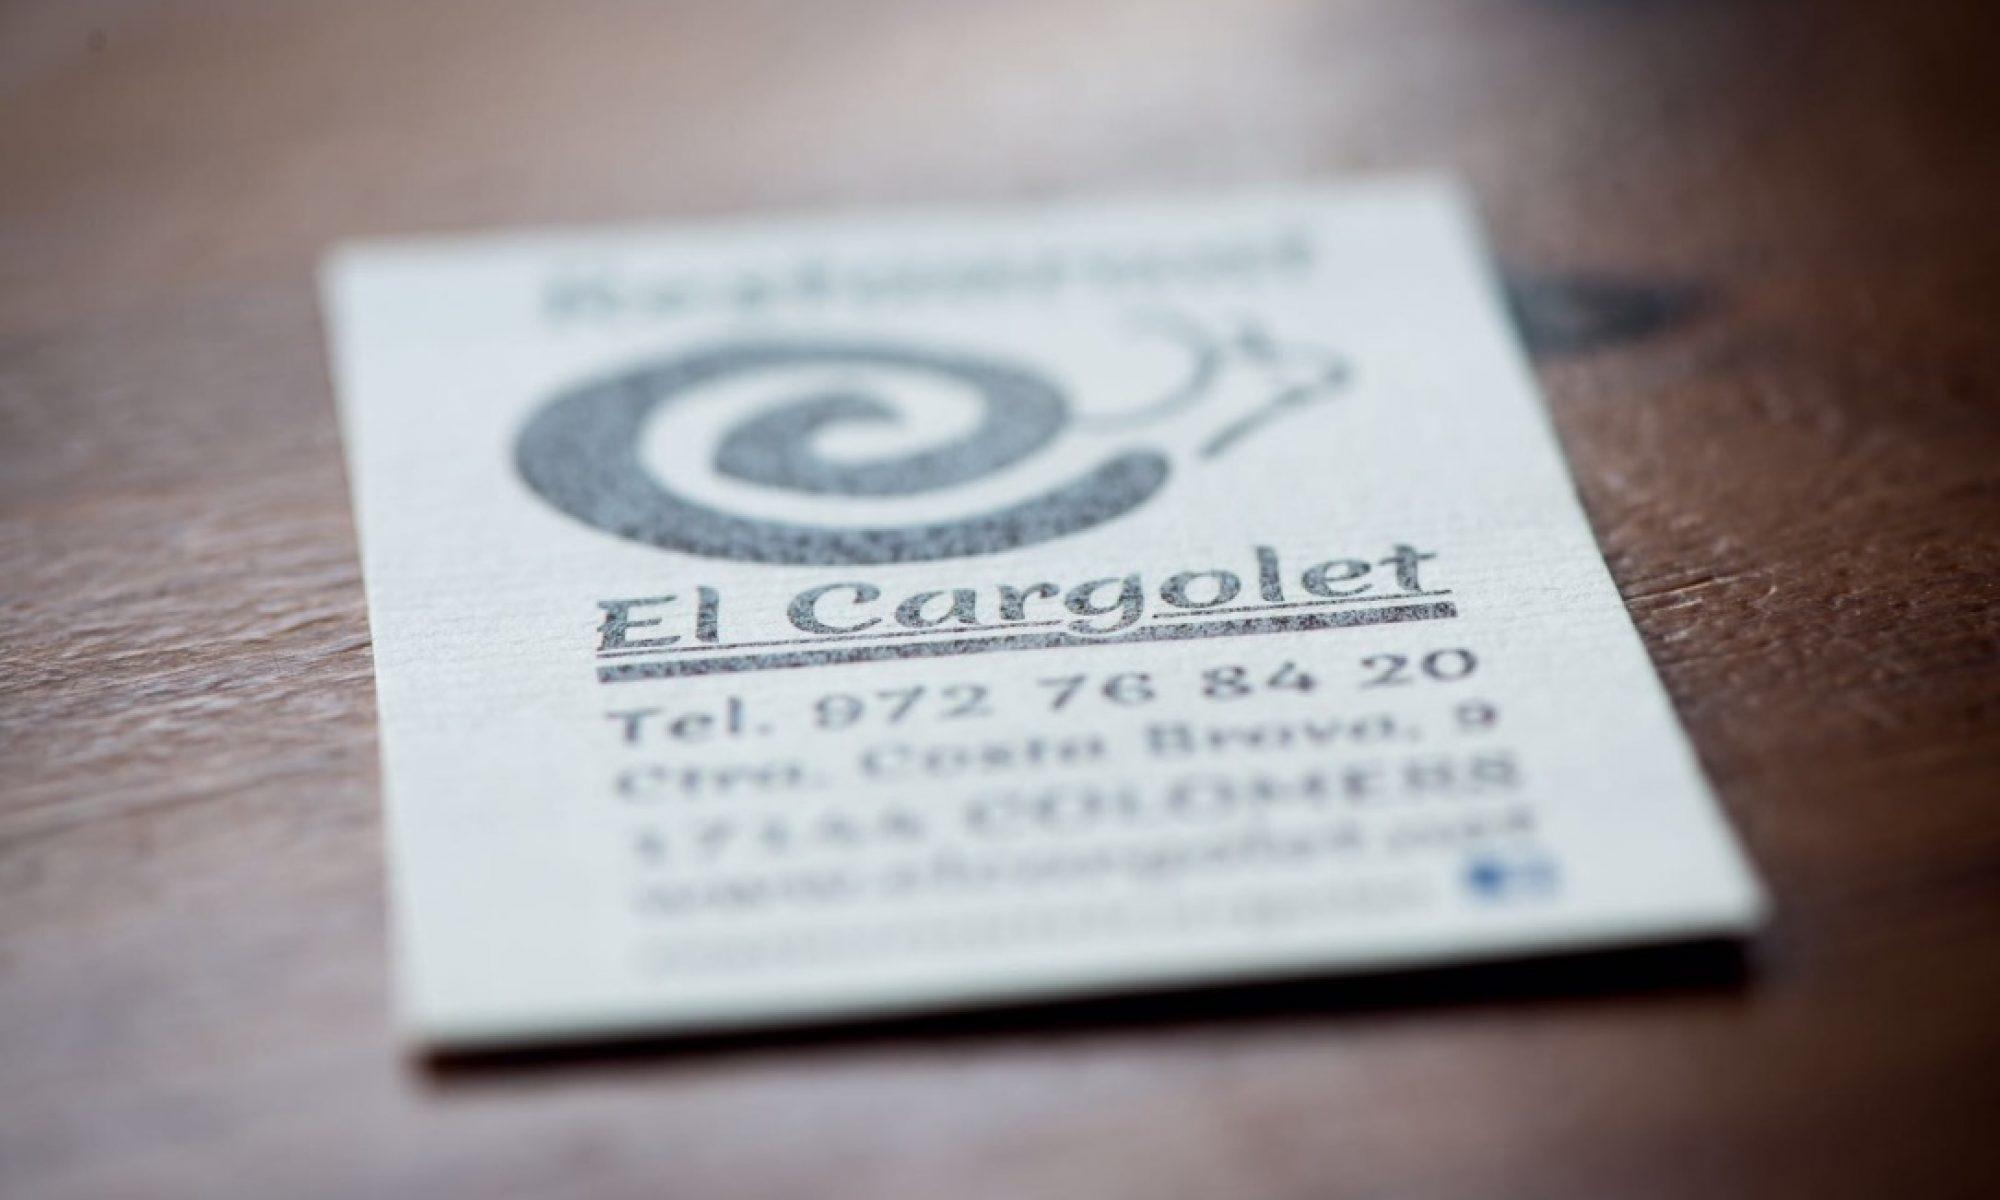 Restaurant El Cargolet